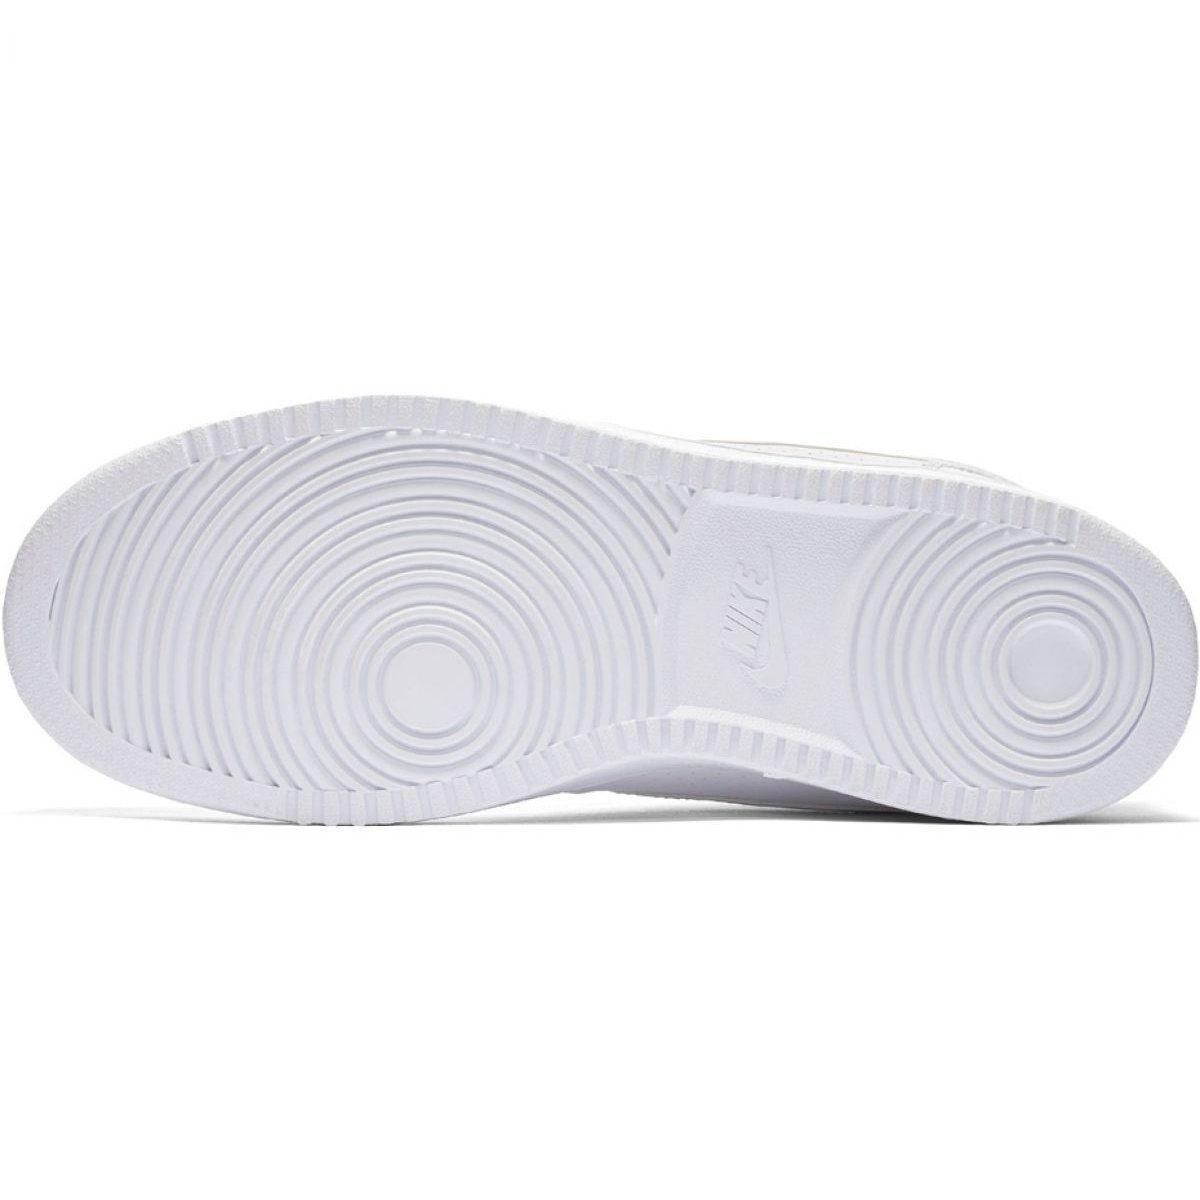 Nike Court Borough Mid M 838938 111 Shoes White Mens Nike Shoes Nike Nike Shoes